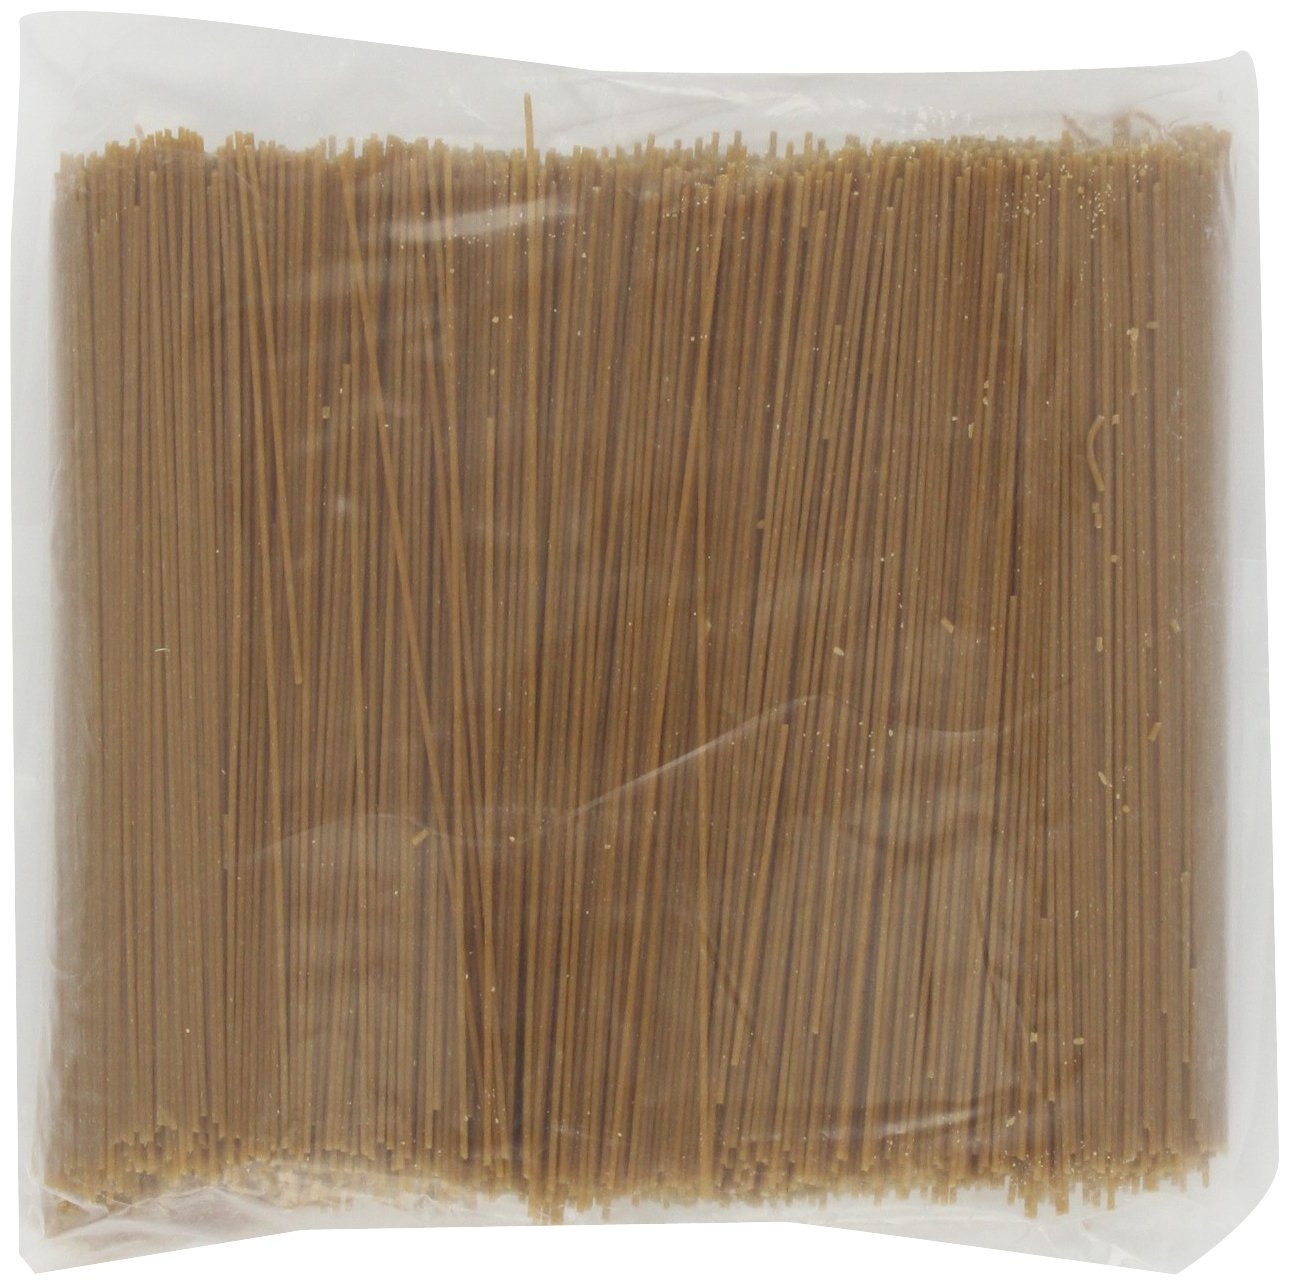 bionaturae Organic Whole Wheat Spaghetti, Bulk, 11 Pound Bags